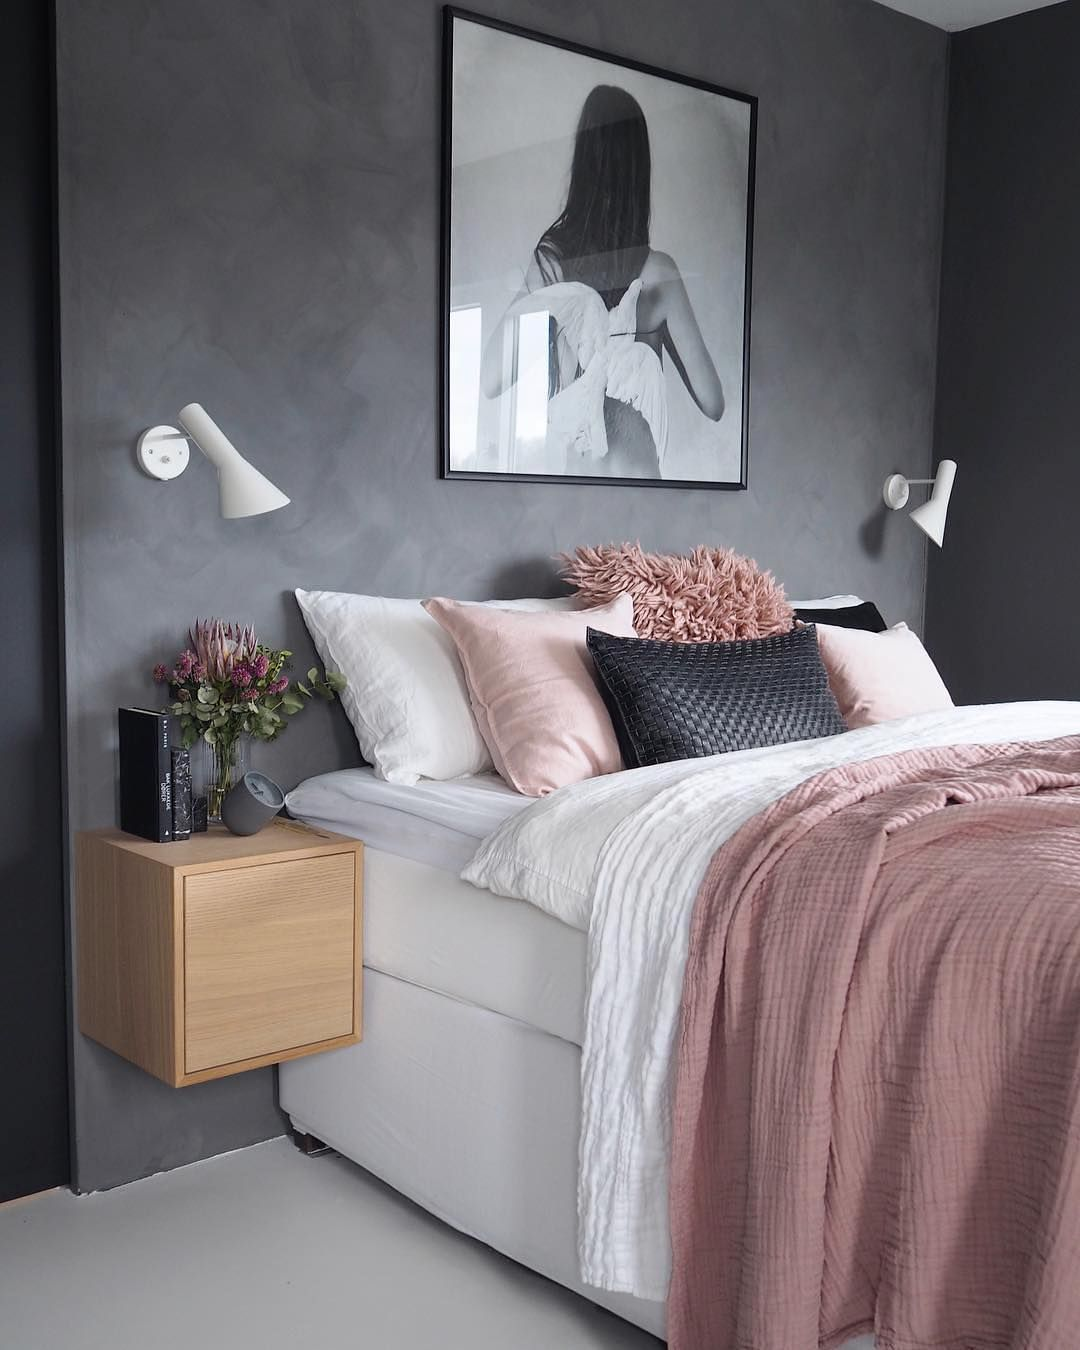 Base de cama box baú